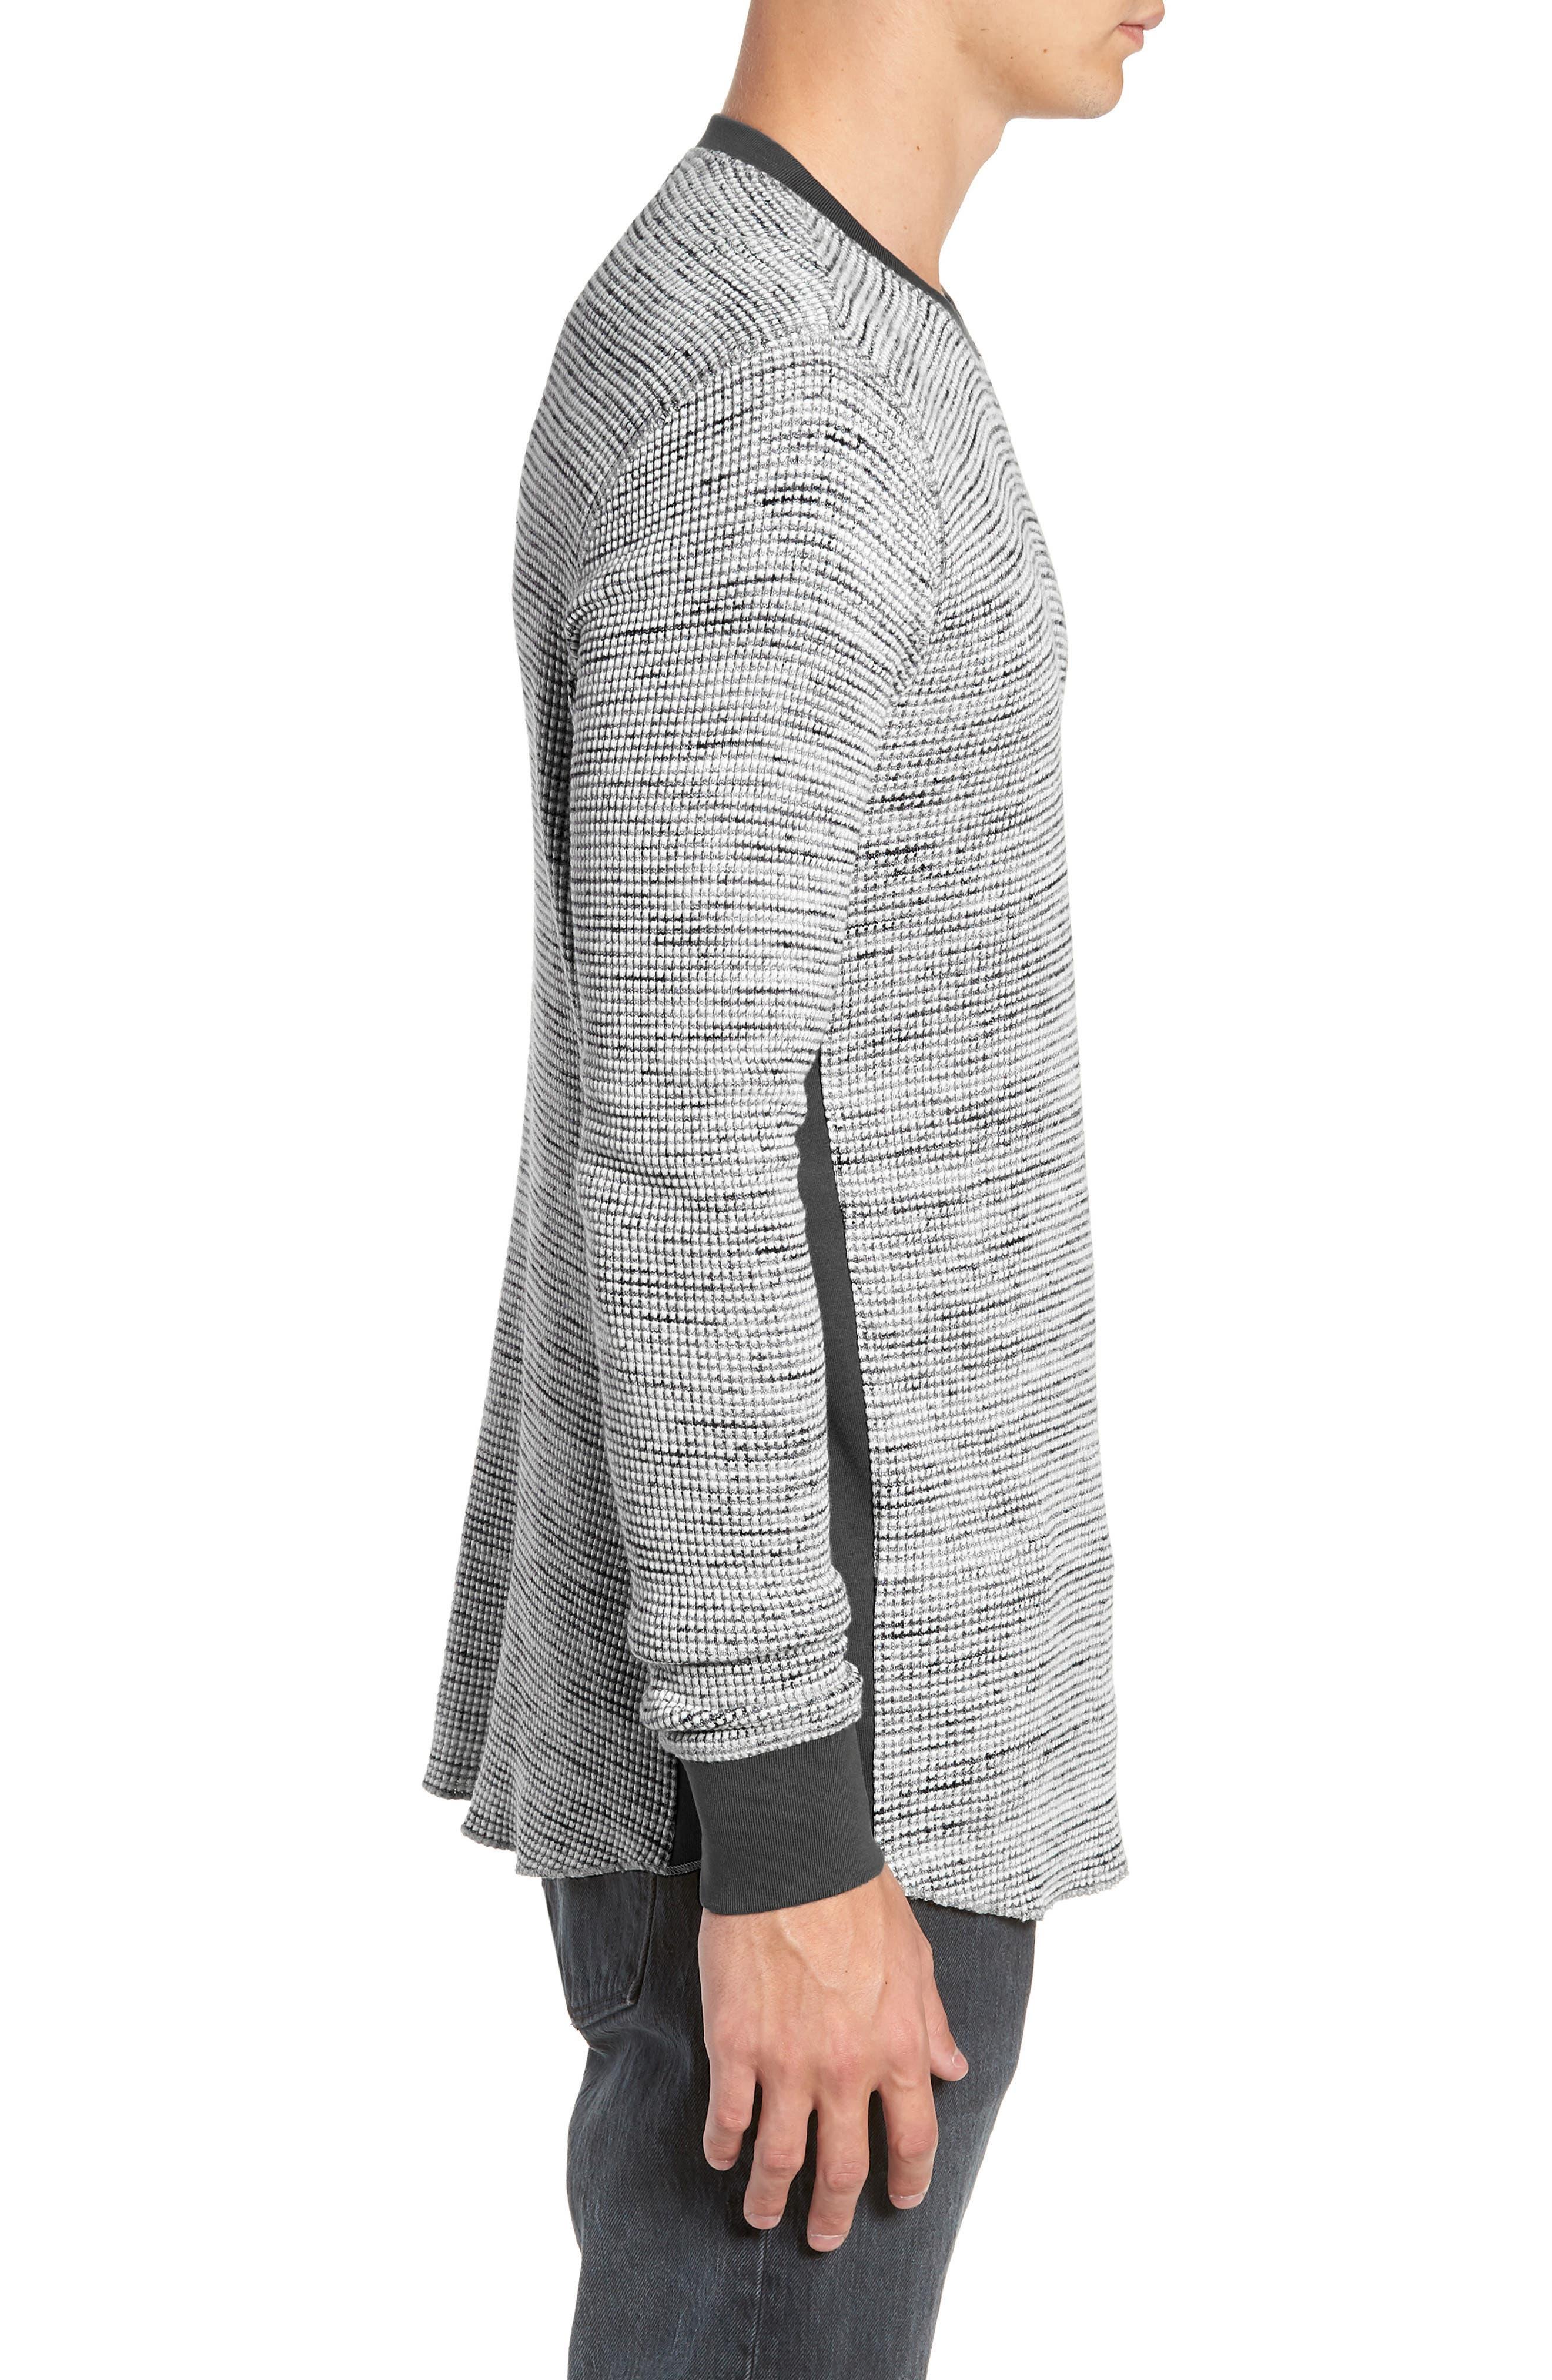 Neps Longline Thermal Shirt,                             Alternate thumbnail 3, color,                             020